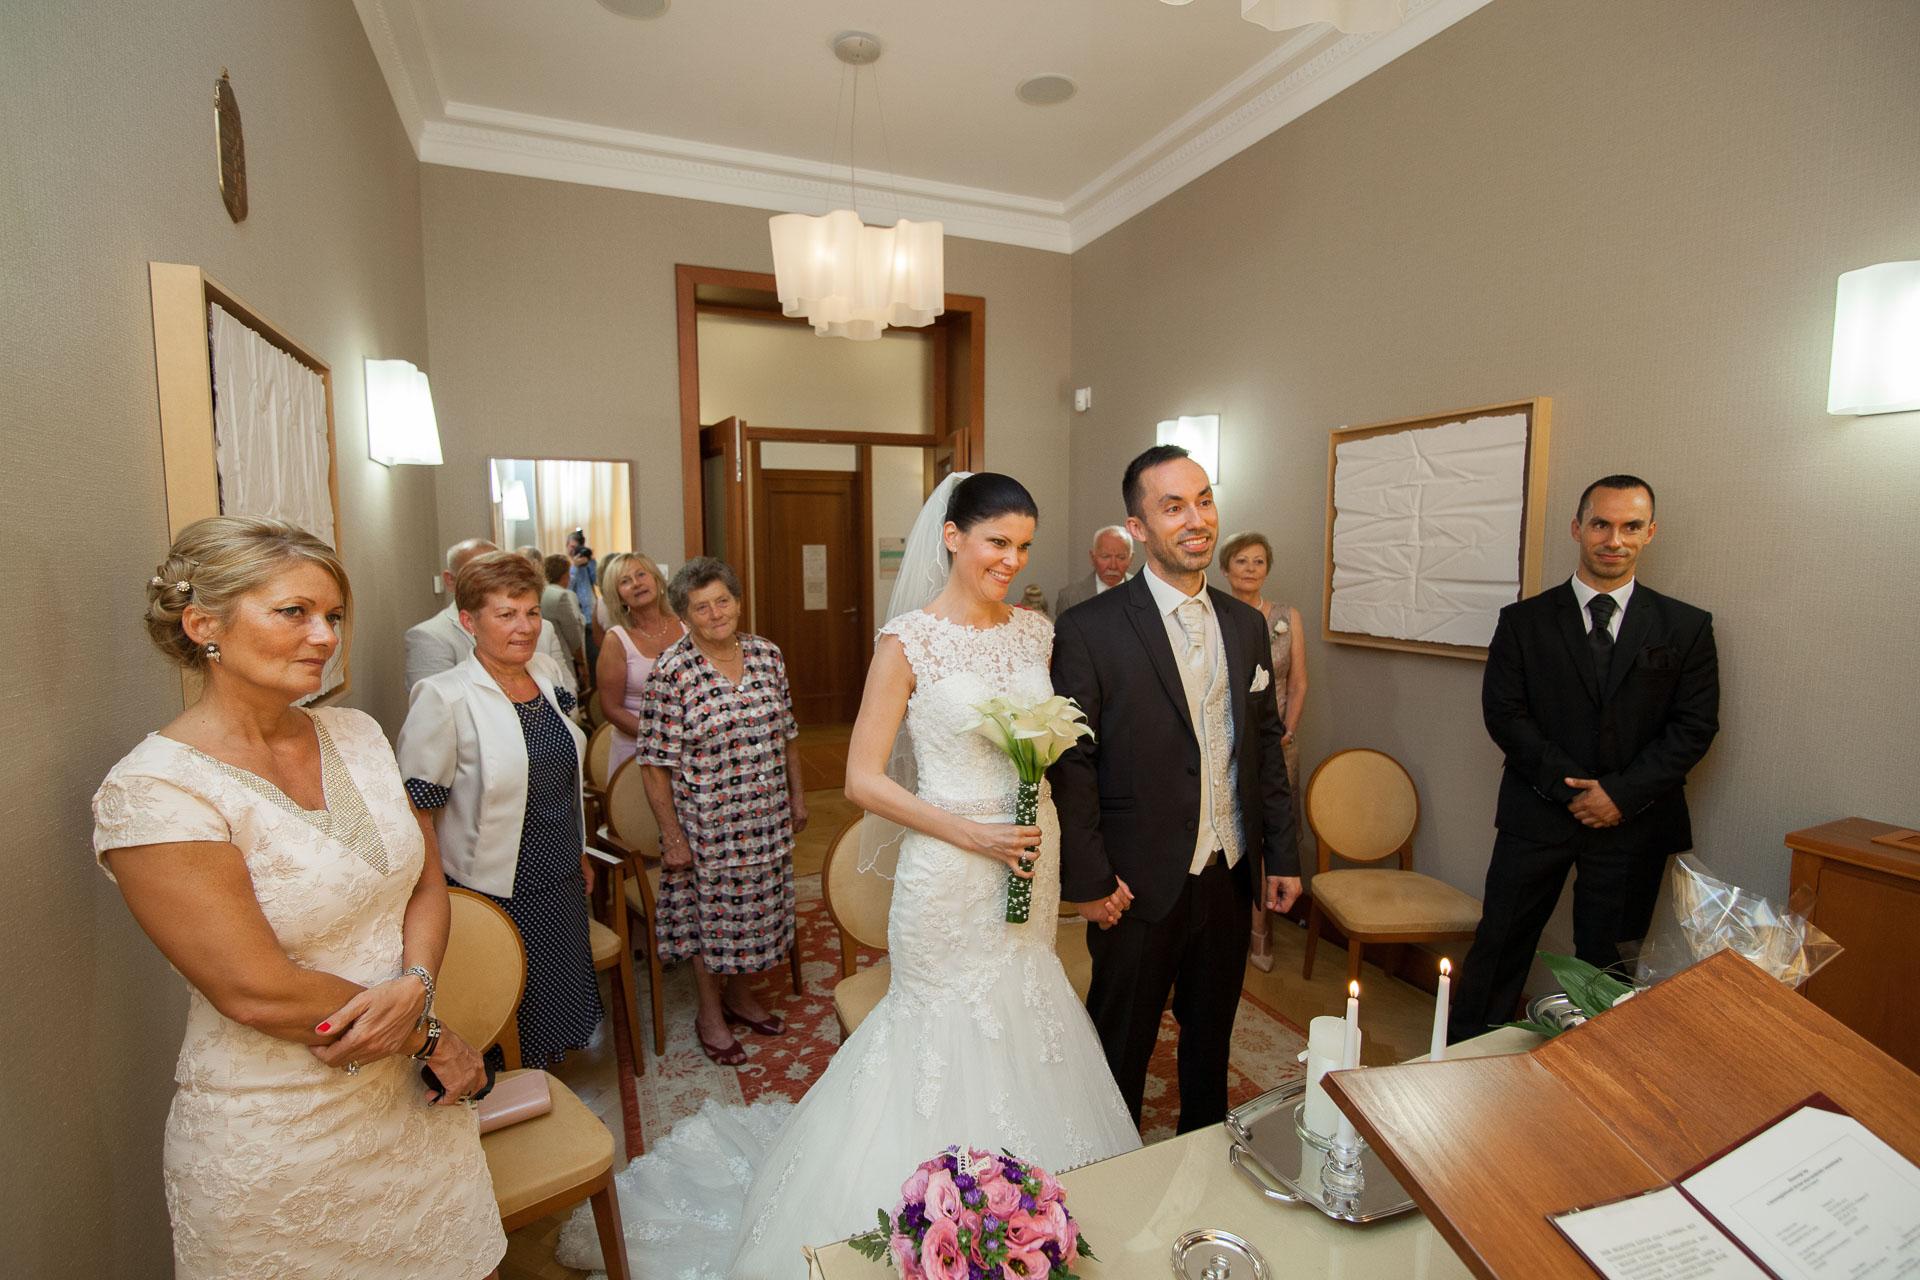 eskuvo_fotozas_wedding_foto_lenart_gabor_sztyui_budapest_IMG_5714